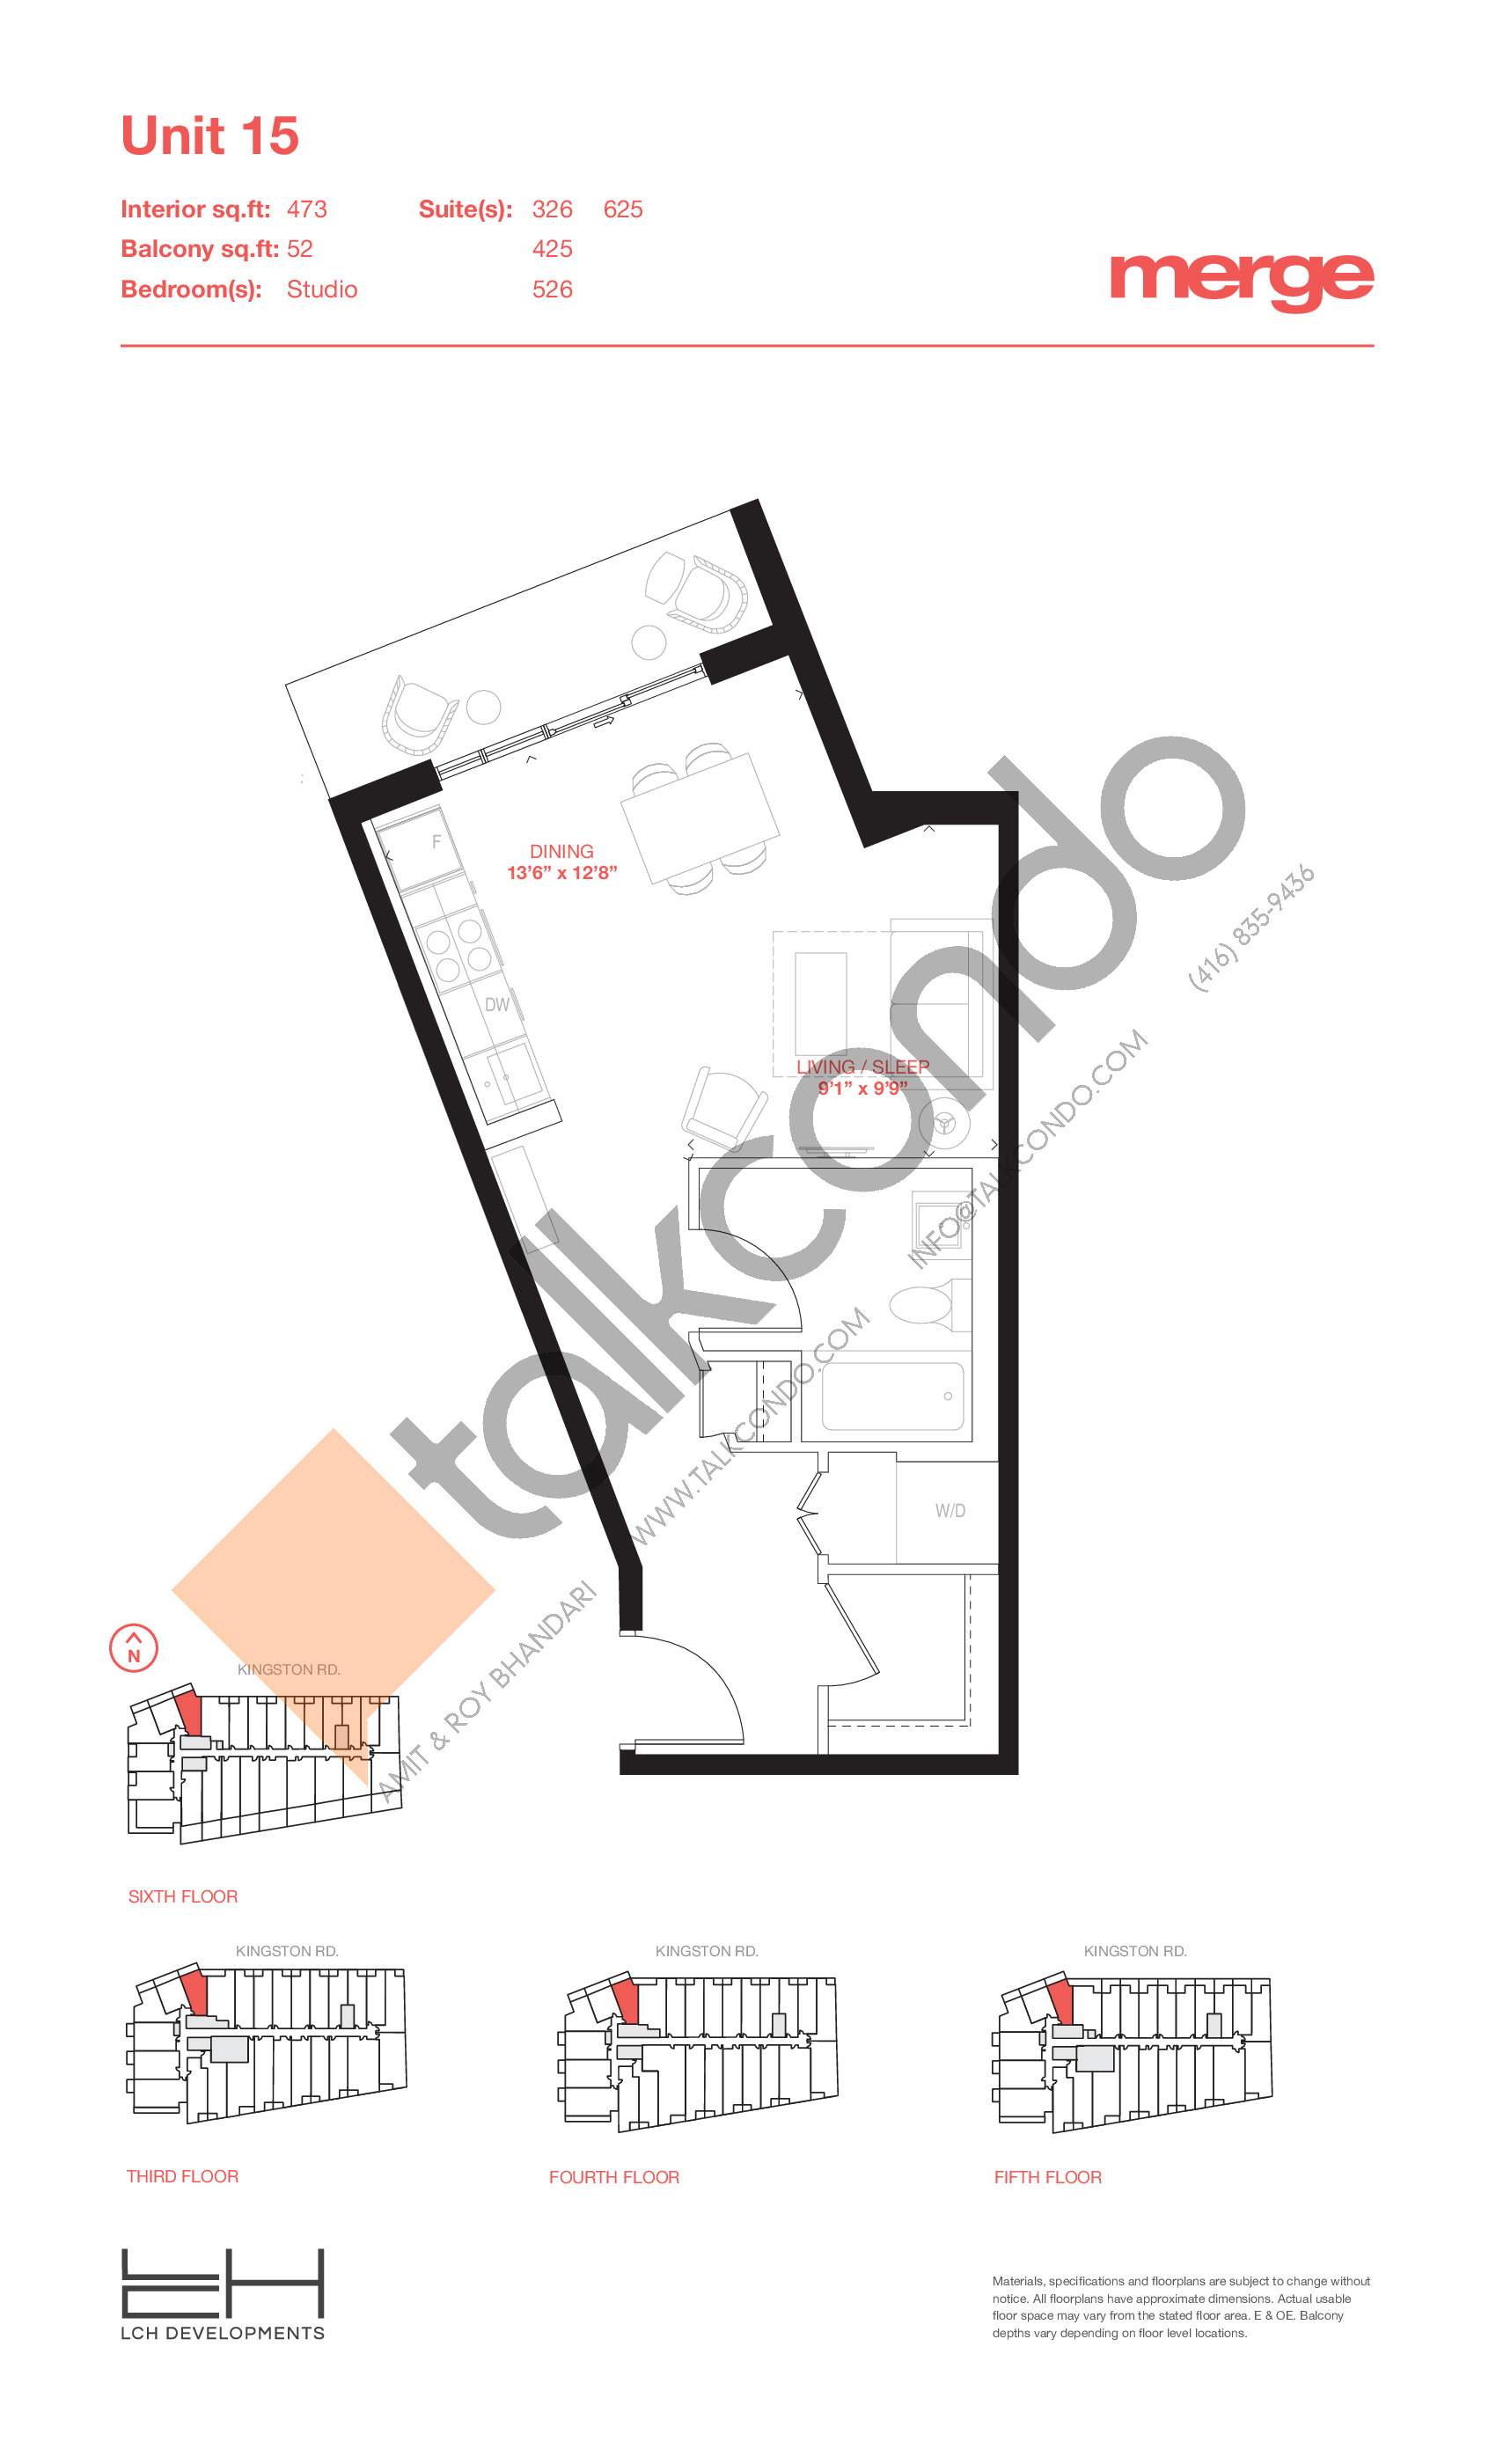 Unit 15 - Tower Floor Plan at Merge Condos - 473 sq.ft